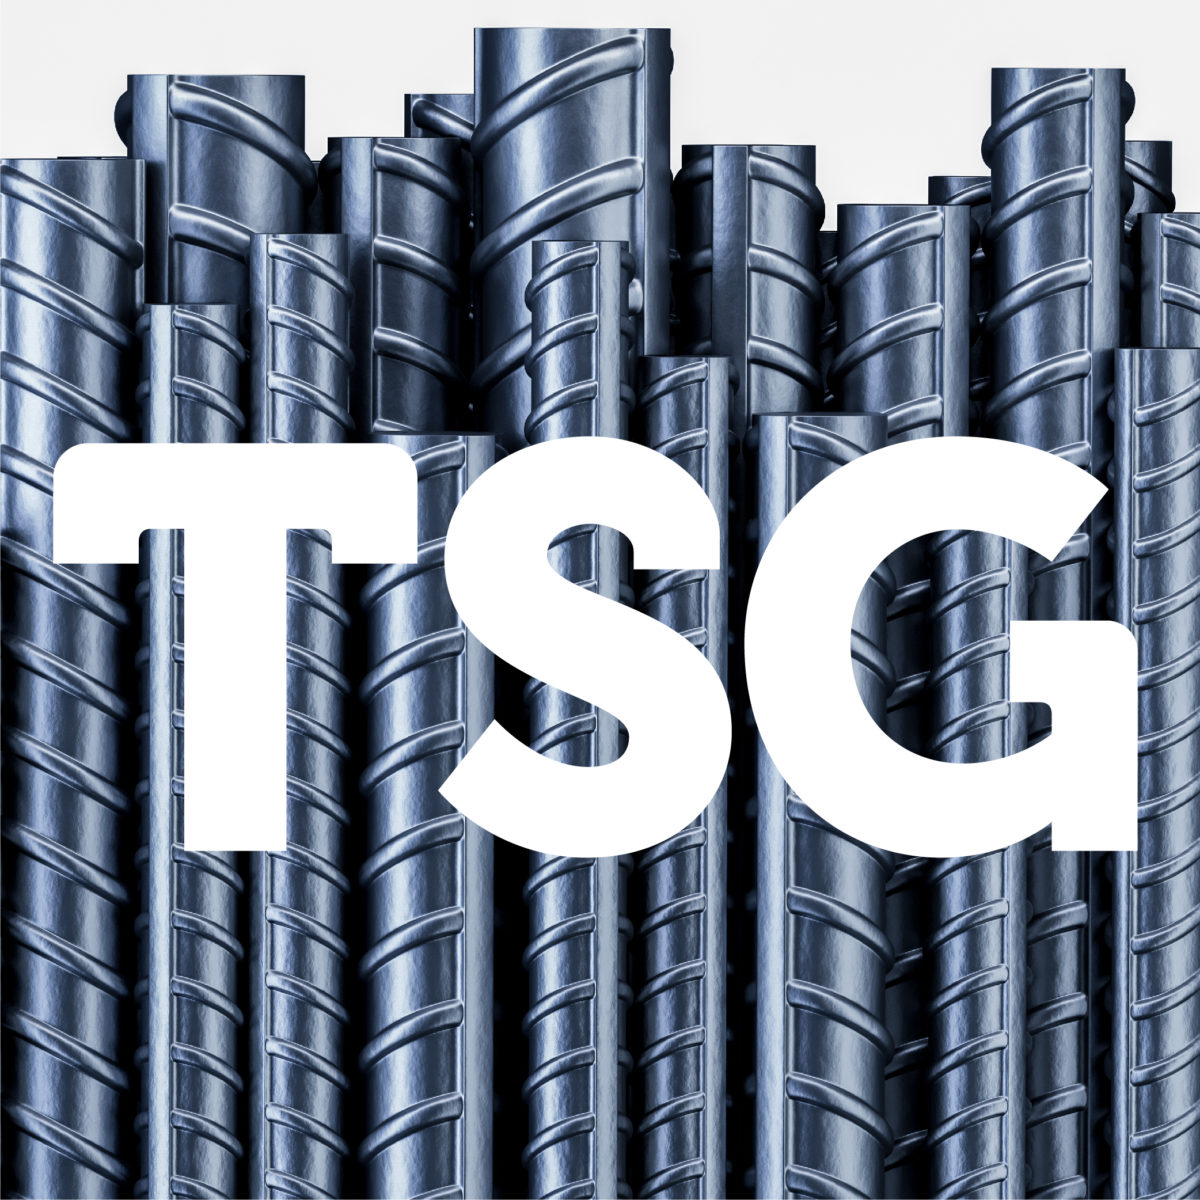 Digital Services for TSG